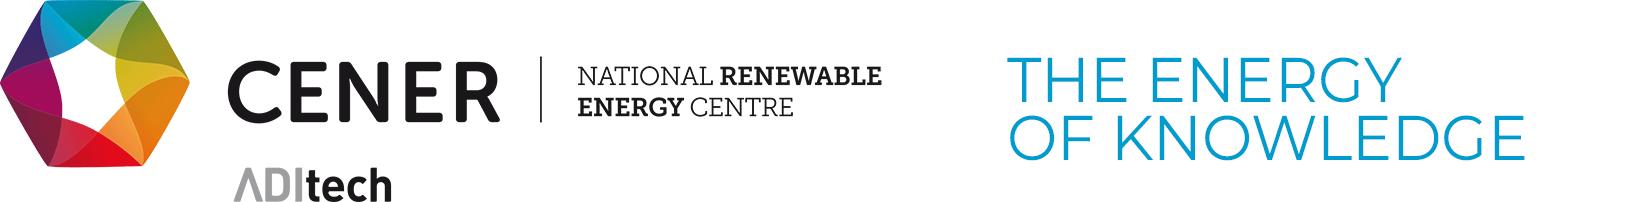 CENER - National Renewable Energy Centre